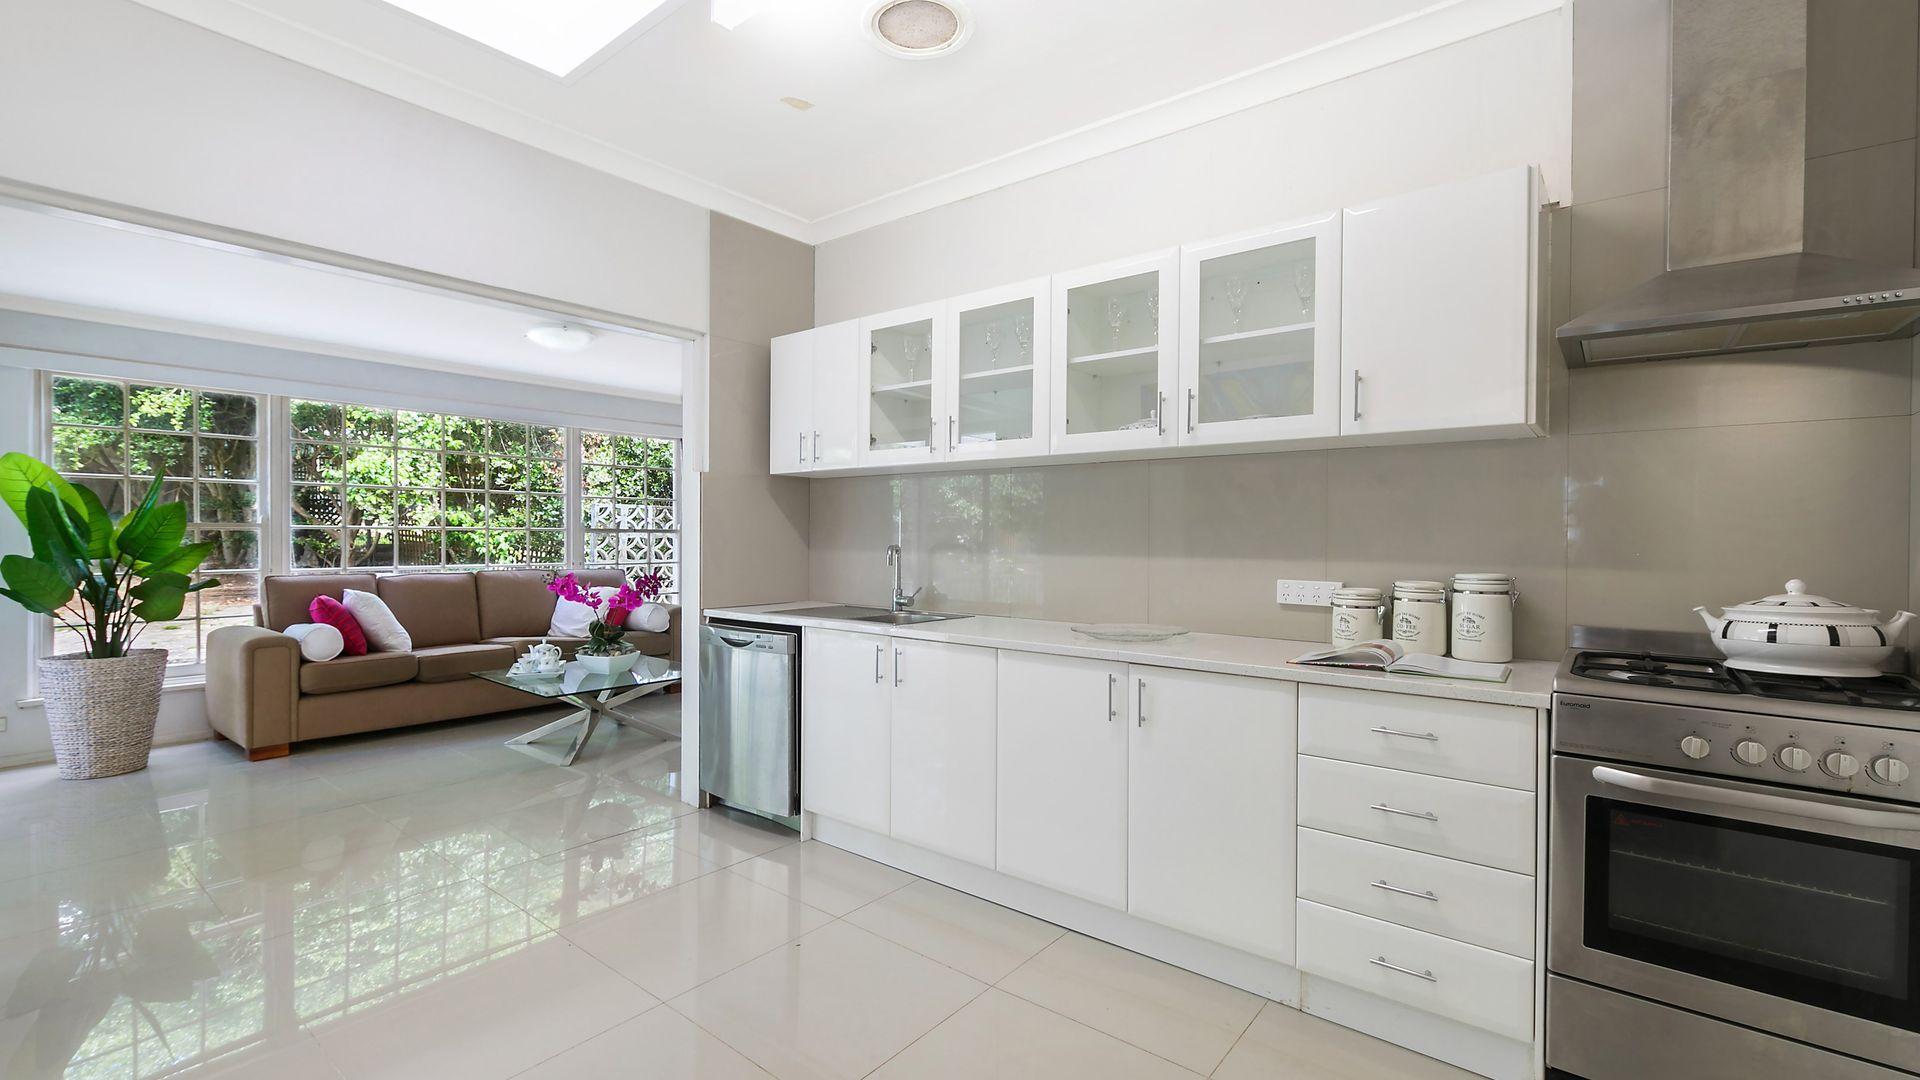 72 Lucinda Ave, Wahroonga NSW 2076, Image 1